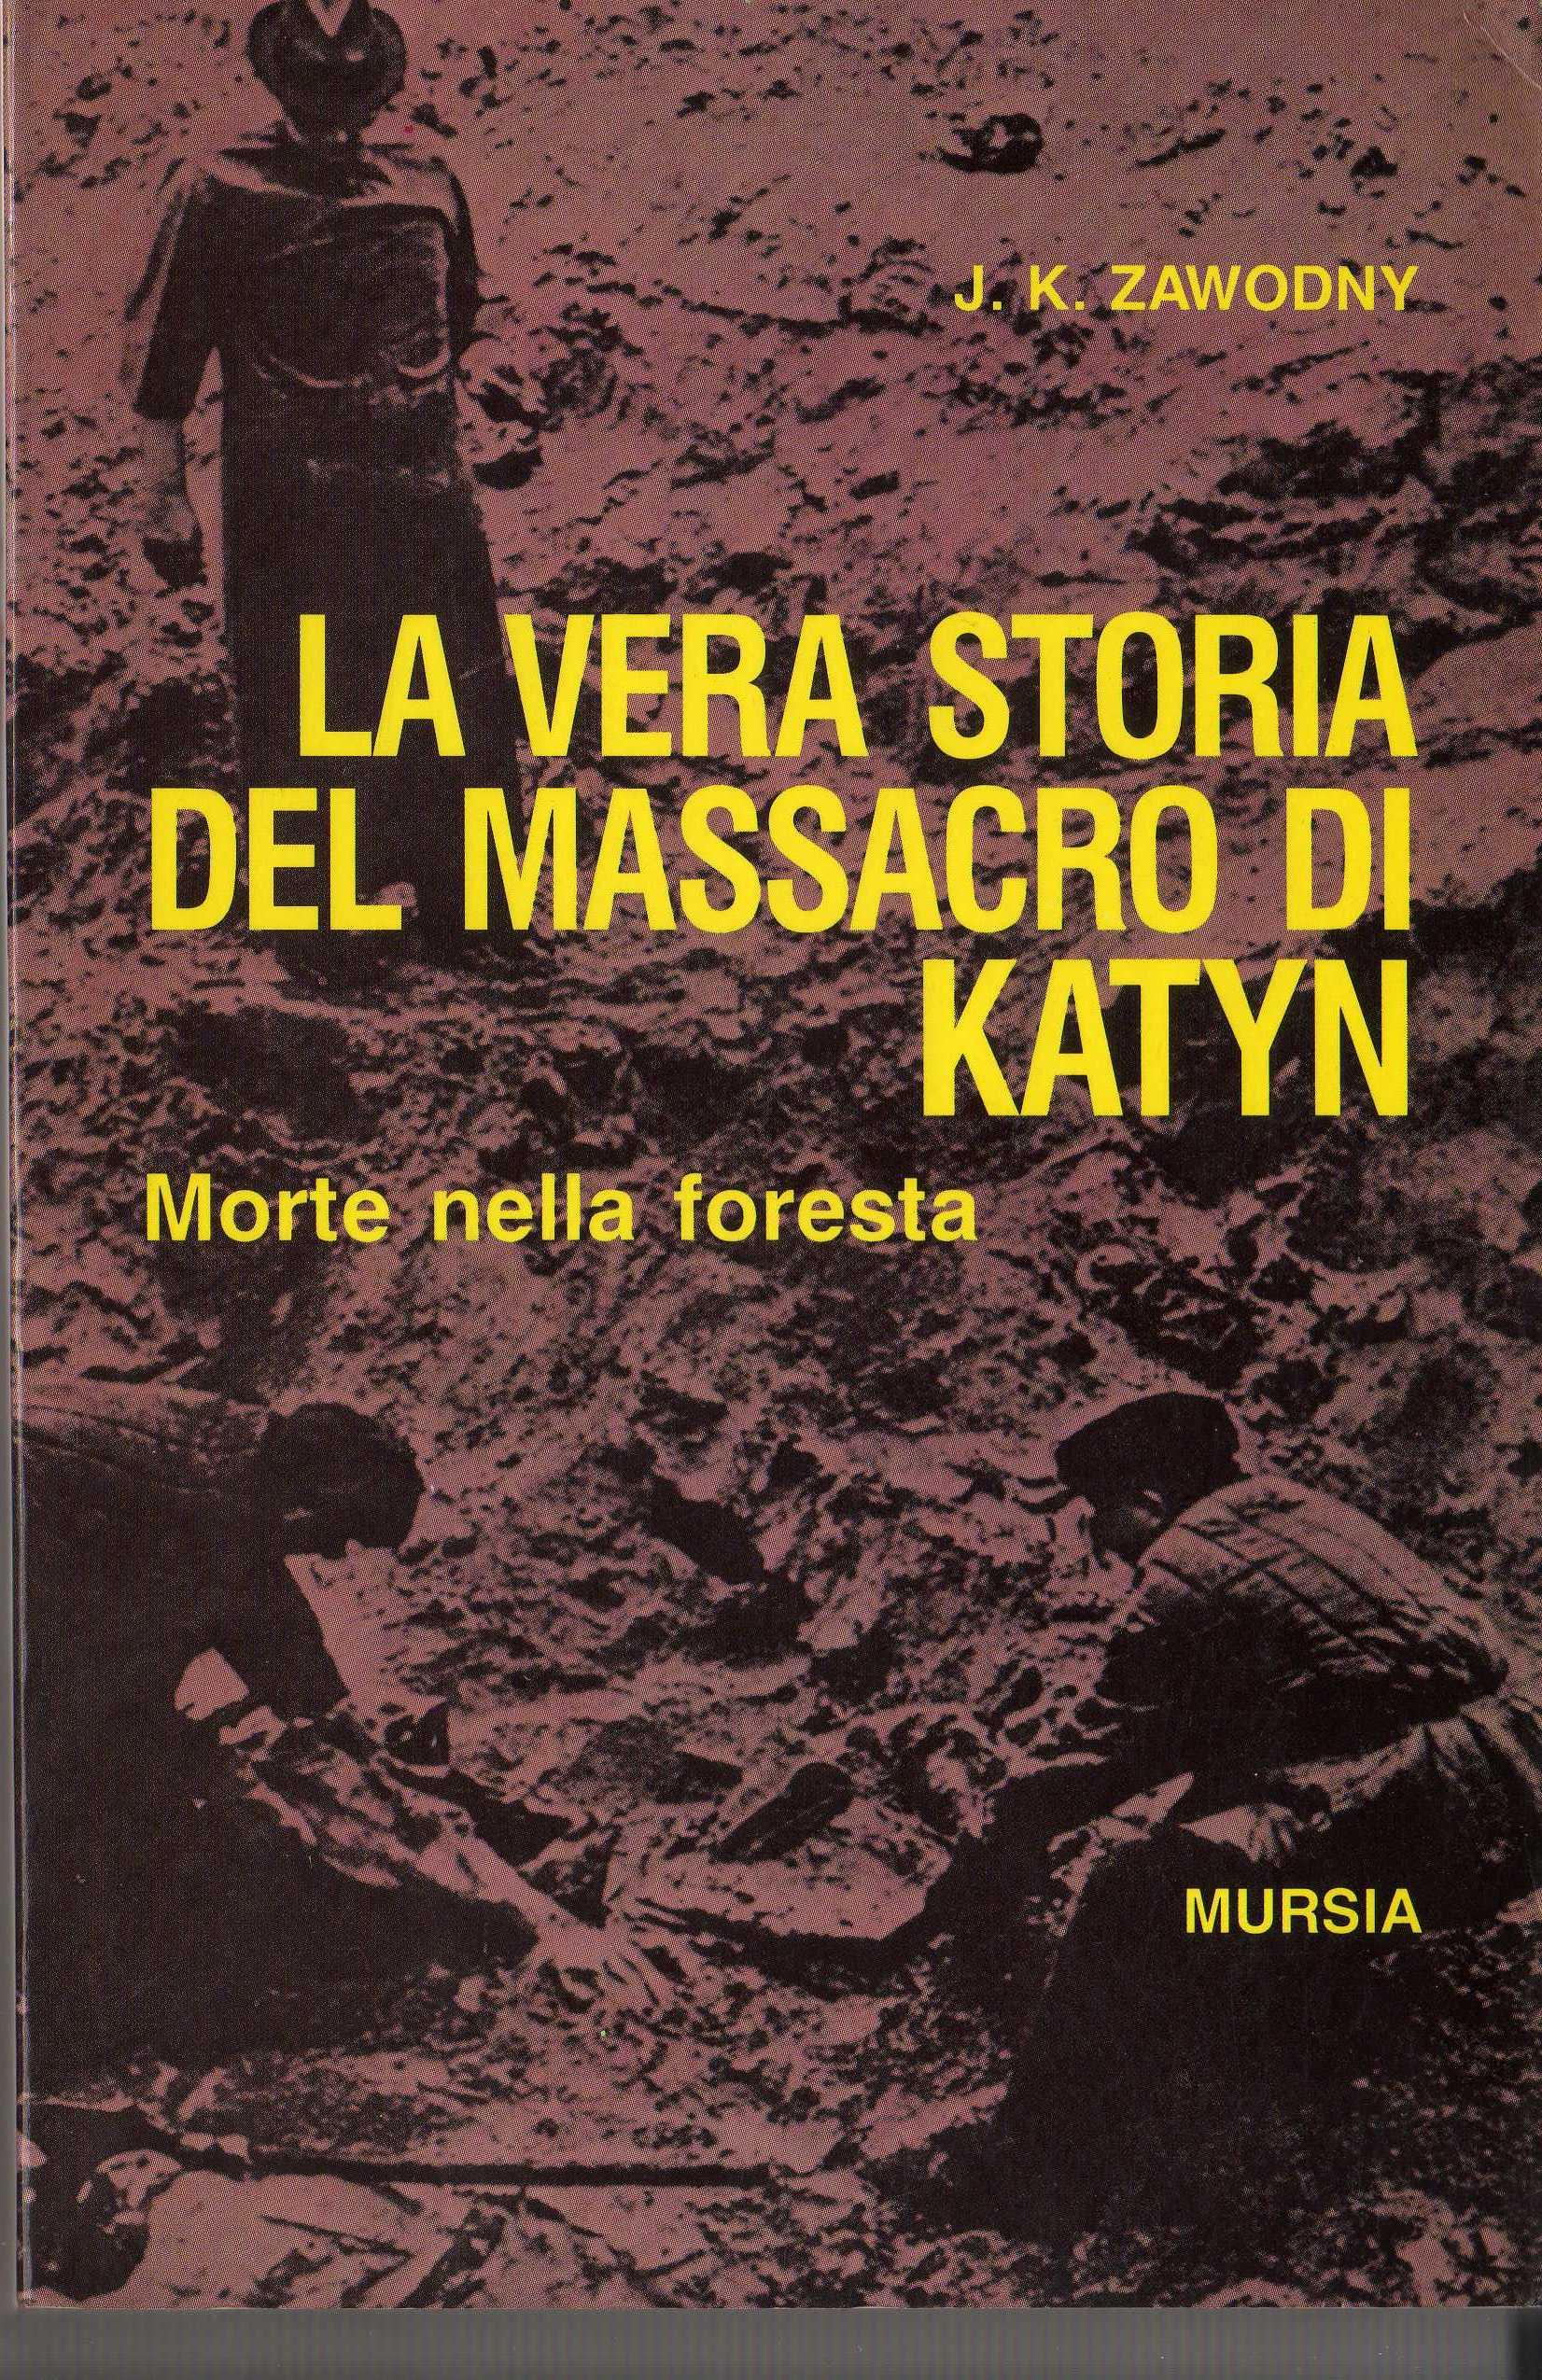 La vera storia del massacro di Katyn